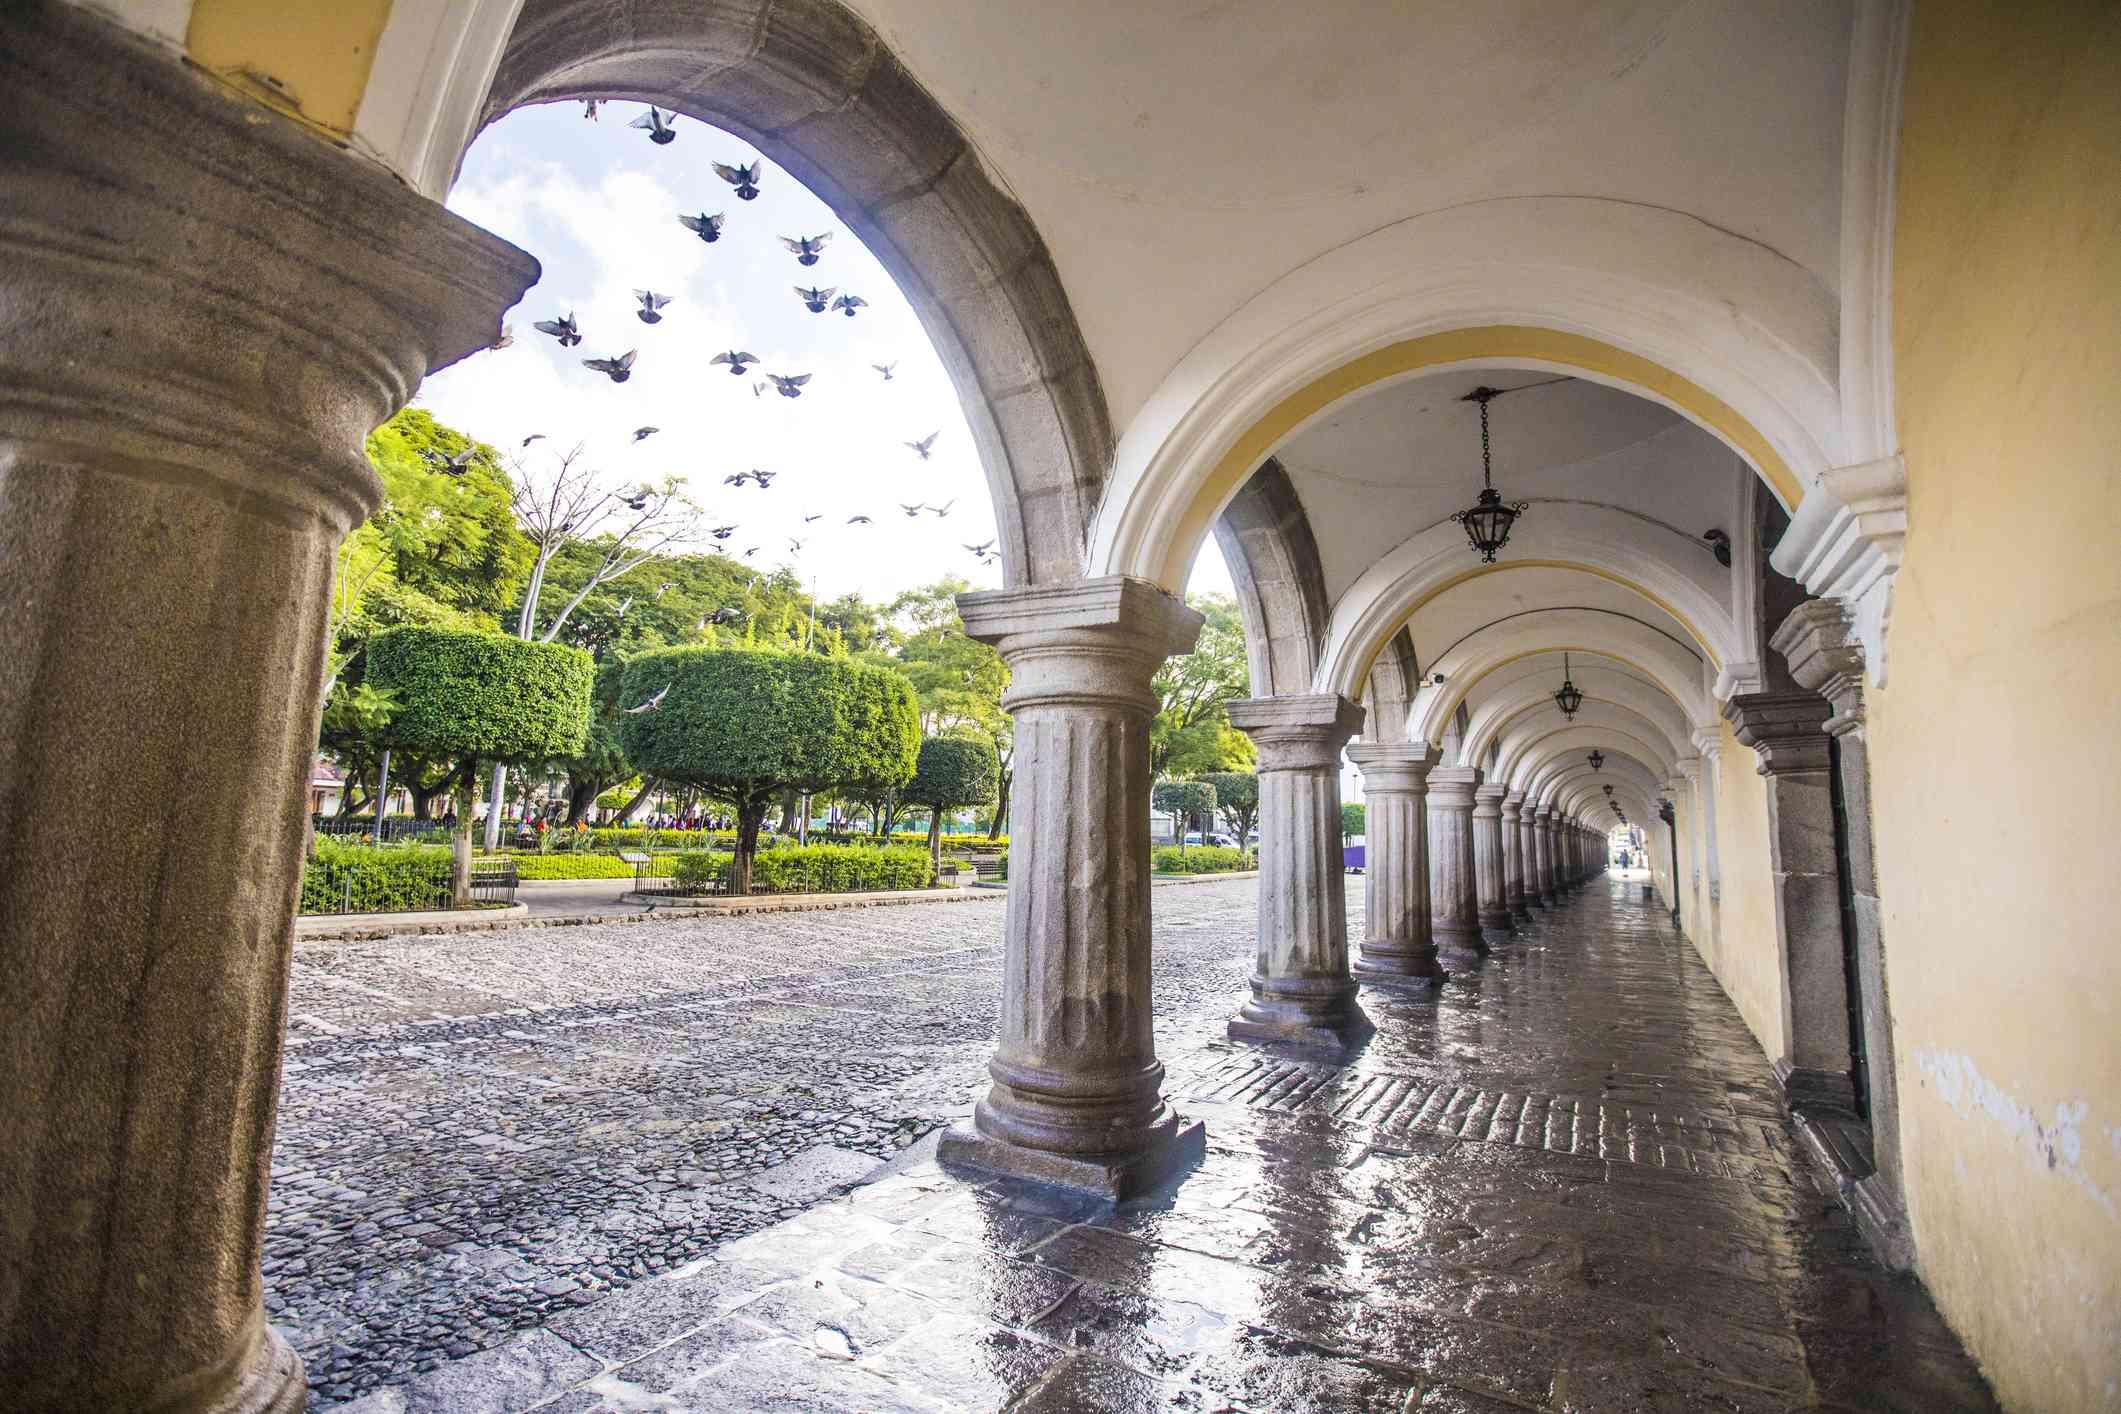 Archways in a hacienda-style building.